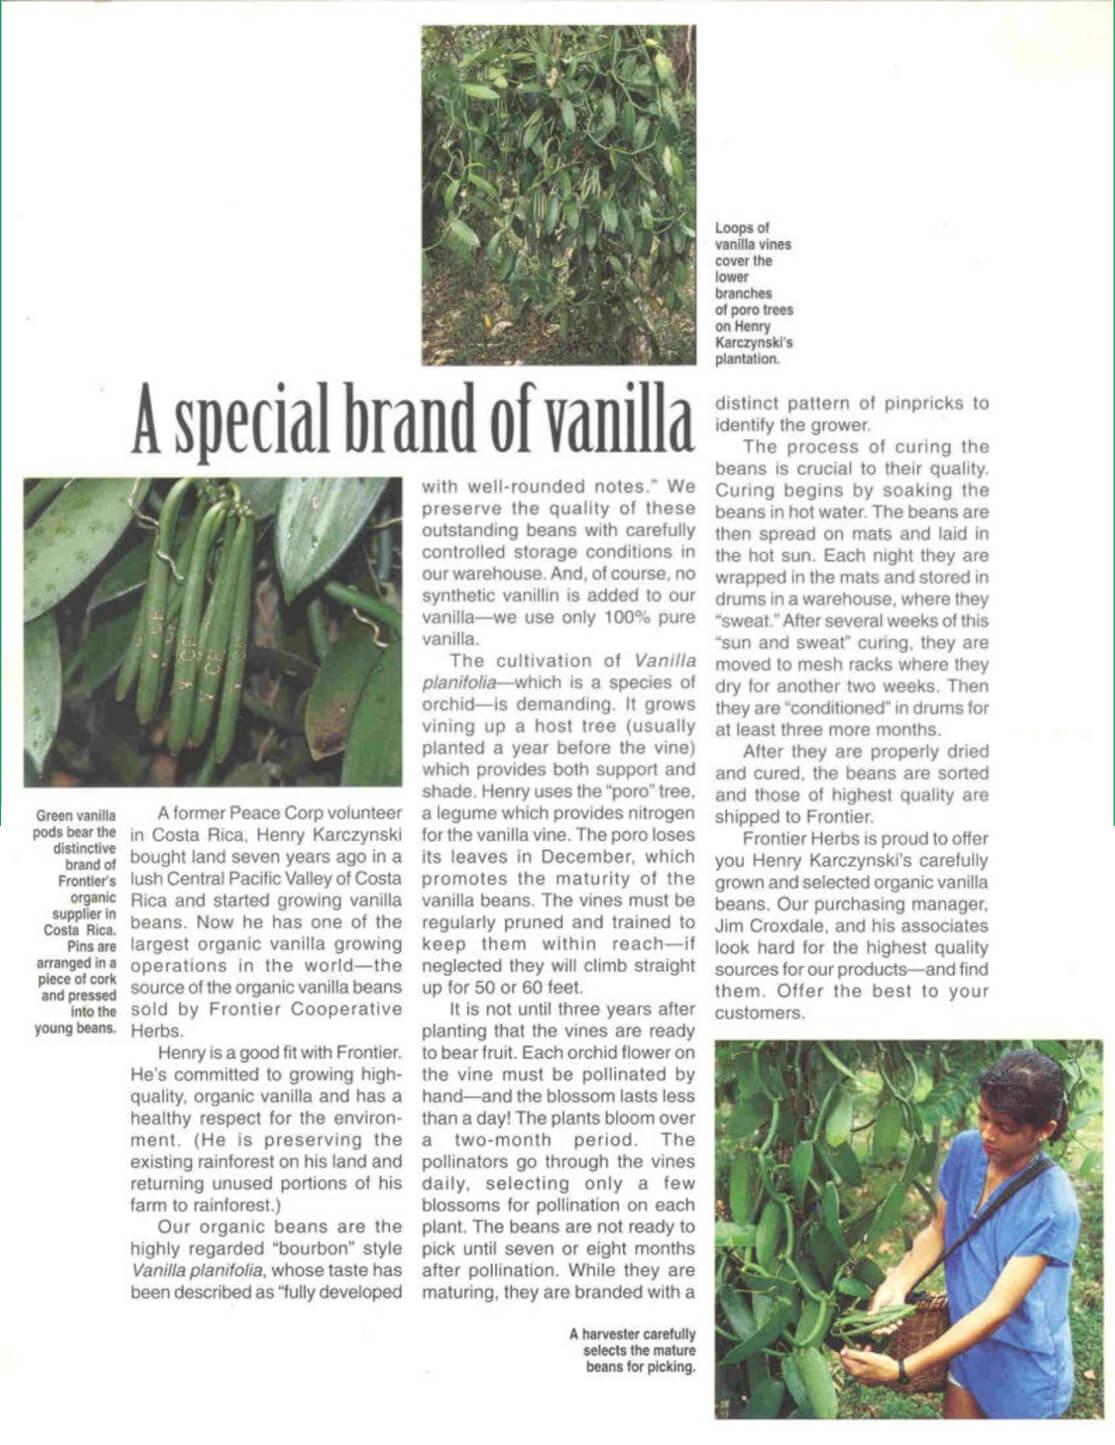 A special brand of Vanilla